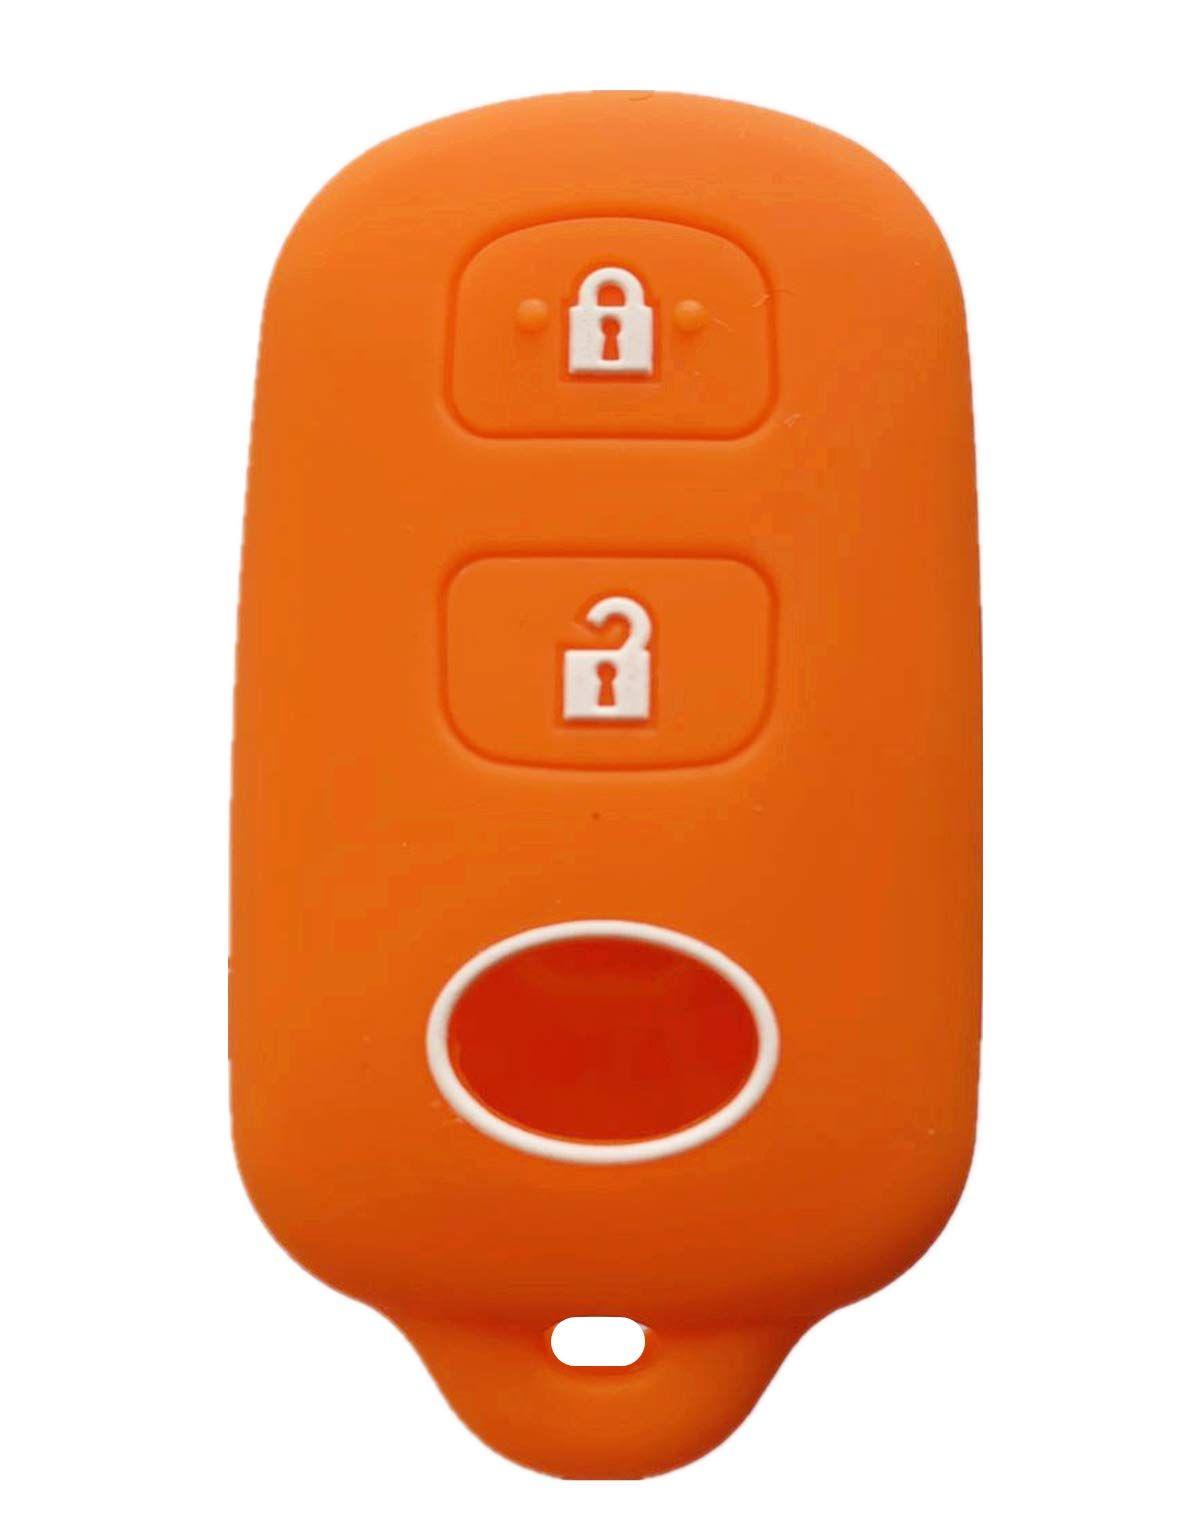 Rpkey Silicone Keyless Entry Remote Control Key Fob Cover Case Protector For Scion Xa Xb Toyota Celica Echo Fj Cruiser Highlande In 2020 Fj Cruiser Toyota Celica Yaris